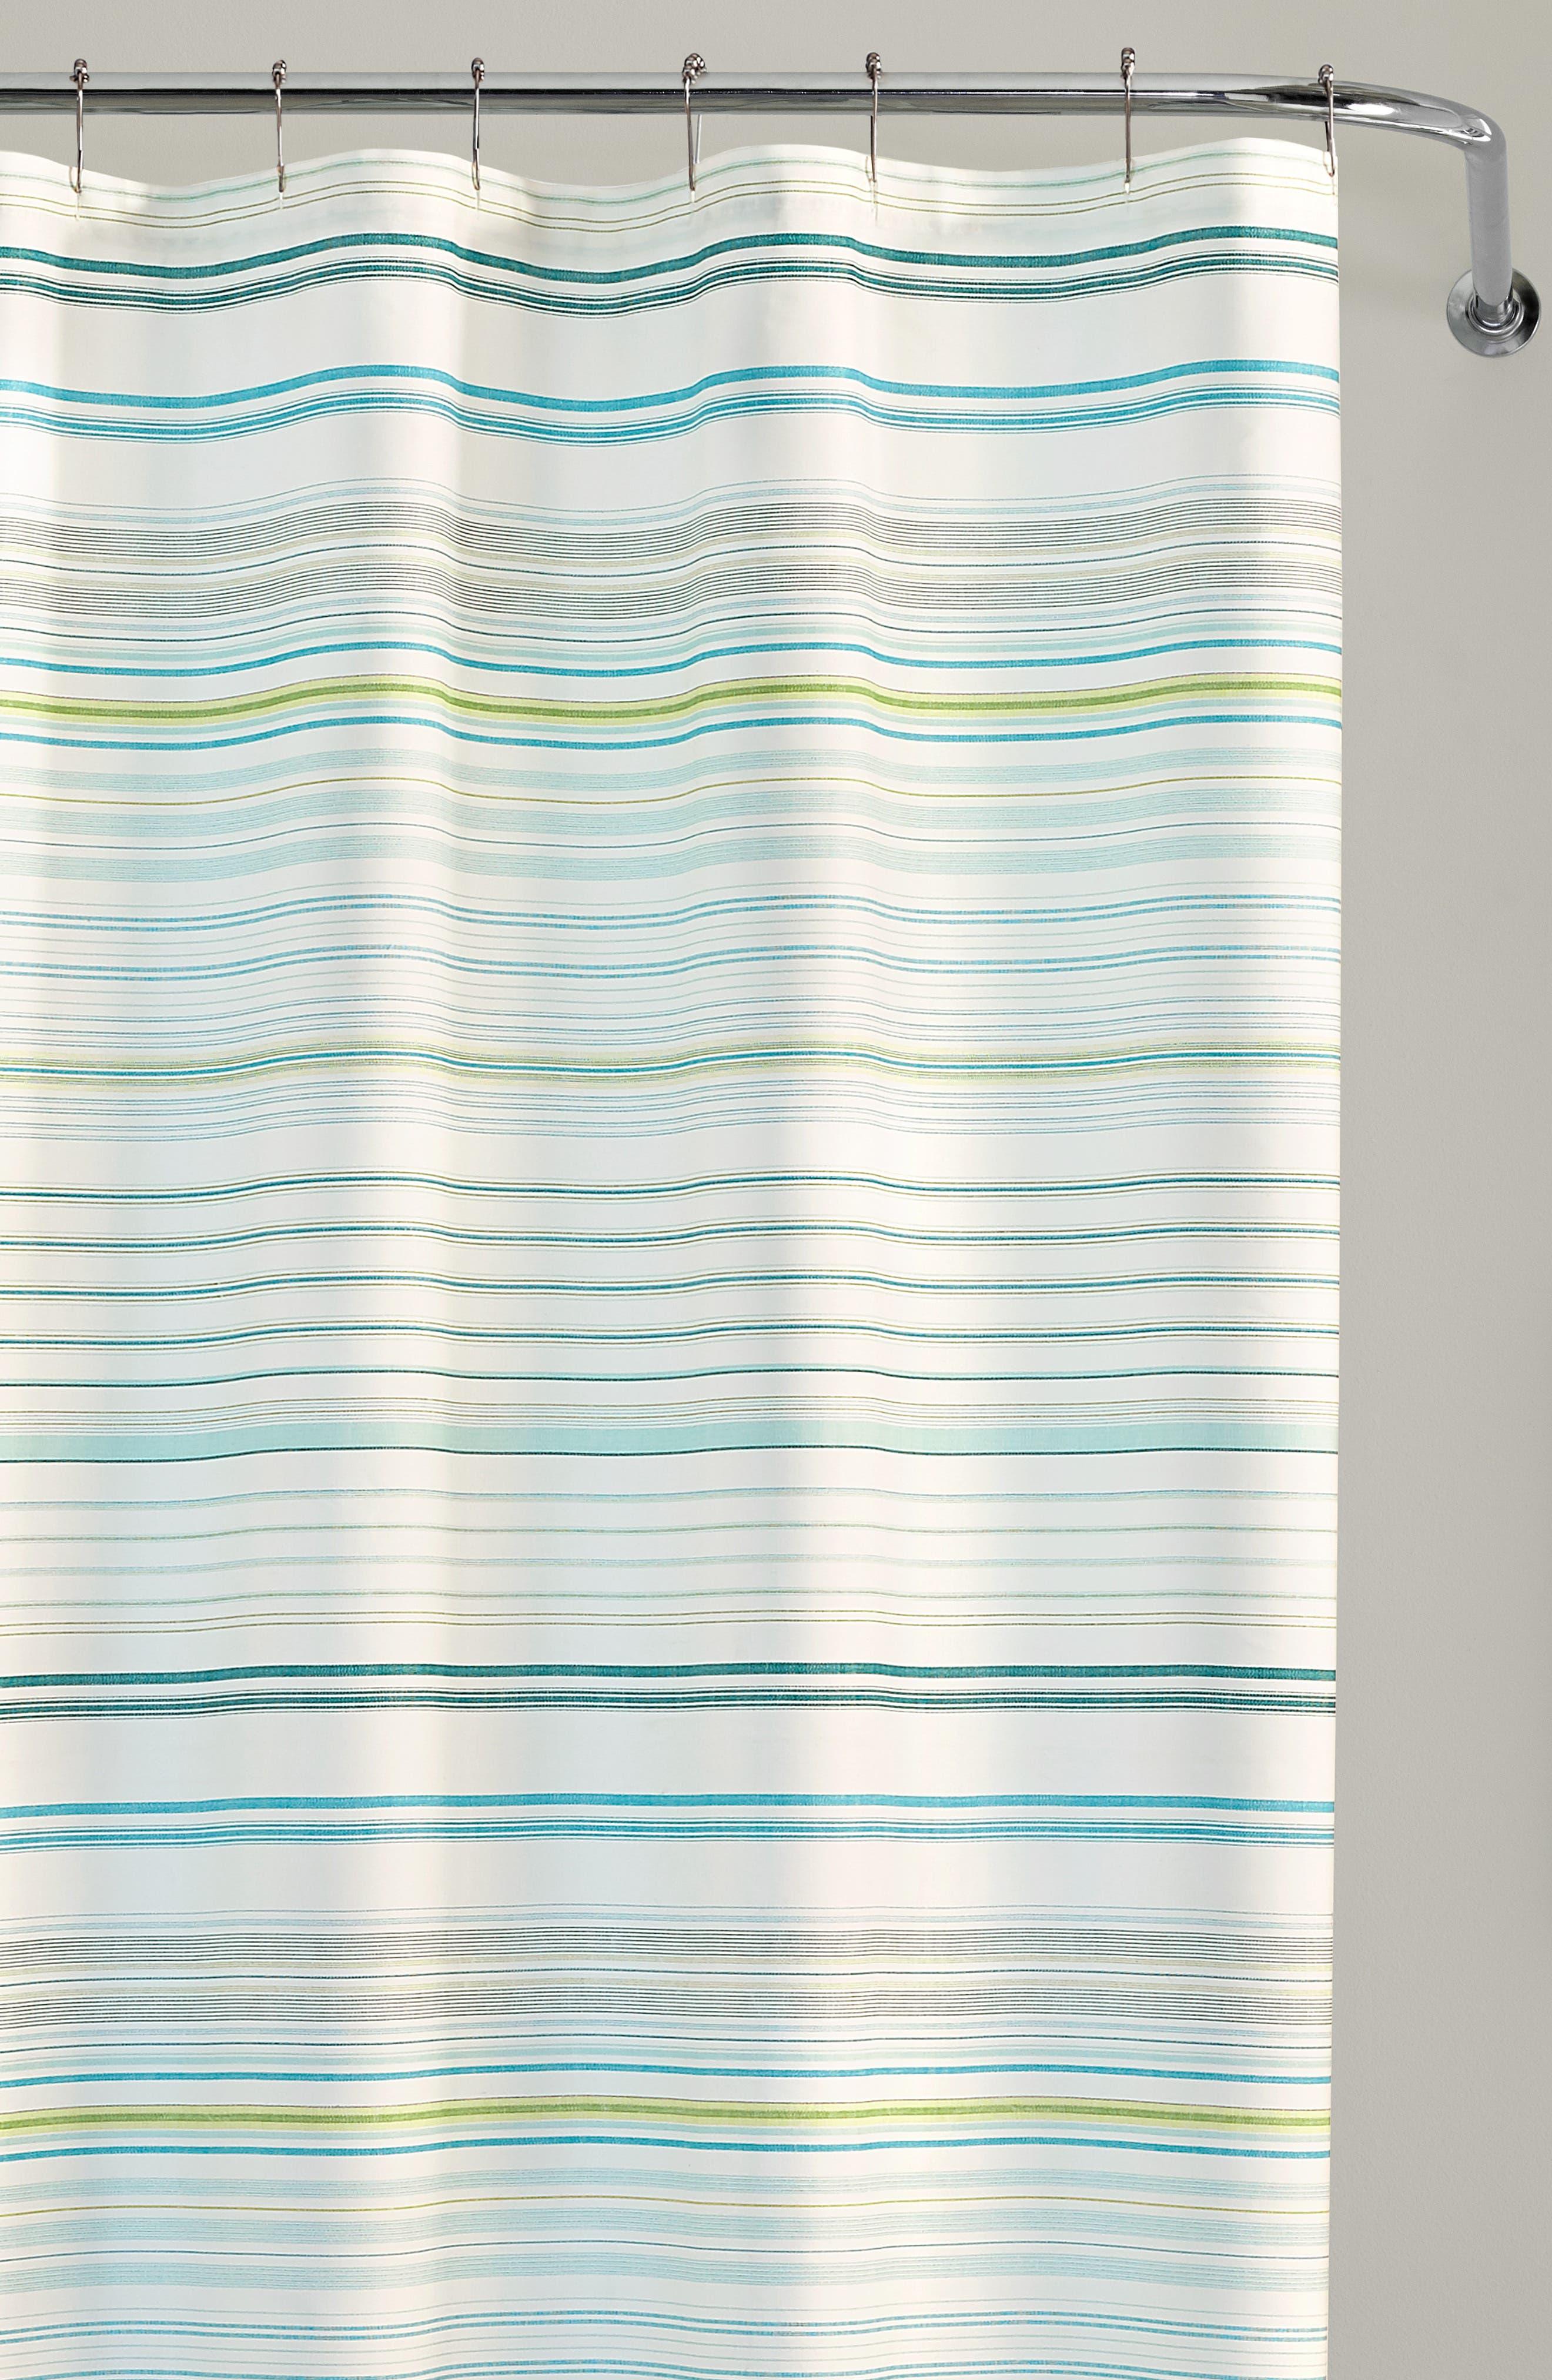 TOMMY BAHAMA,                             La Scala Breezer Shower Curtain,                             Alternate thumbnail 3, color,                             PASTEL GREEN